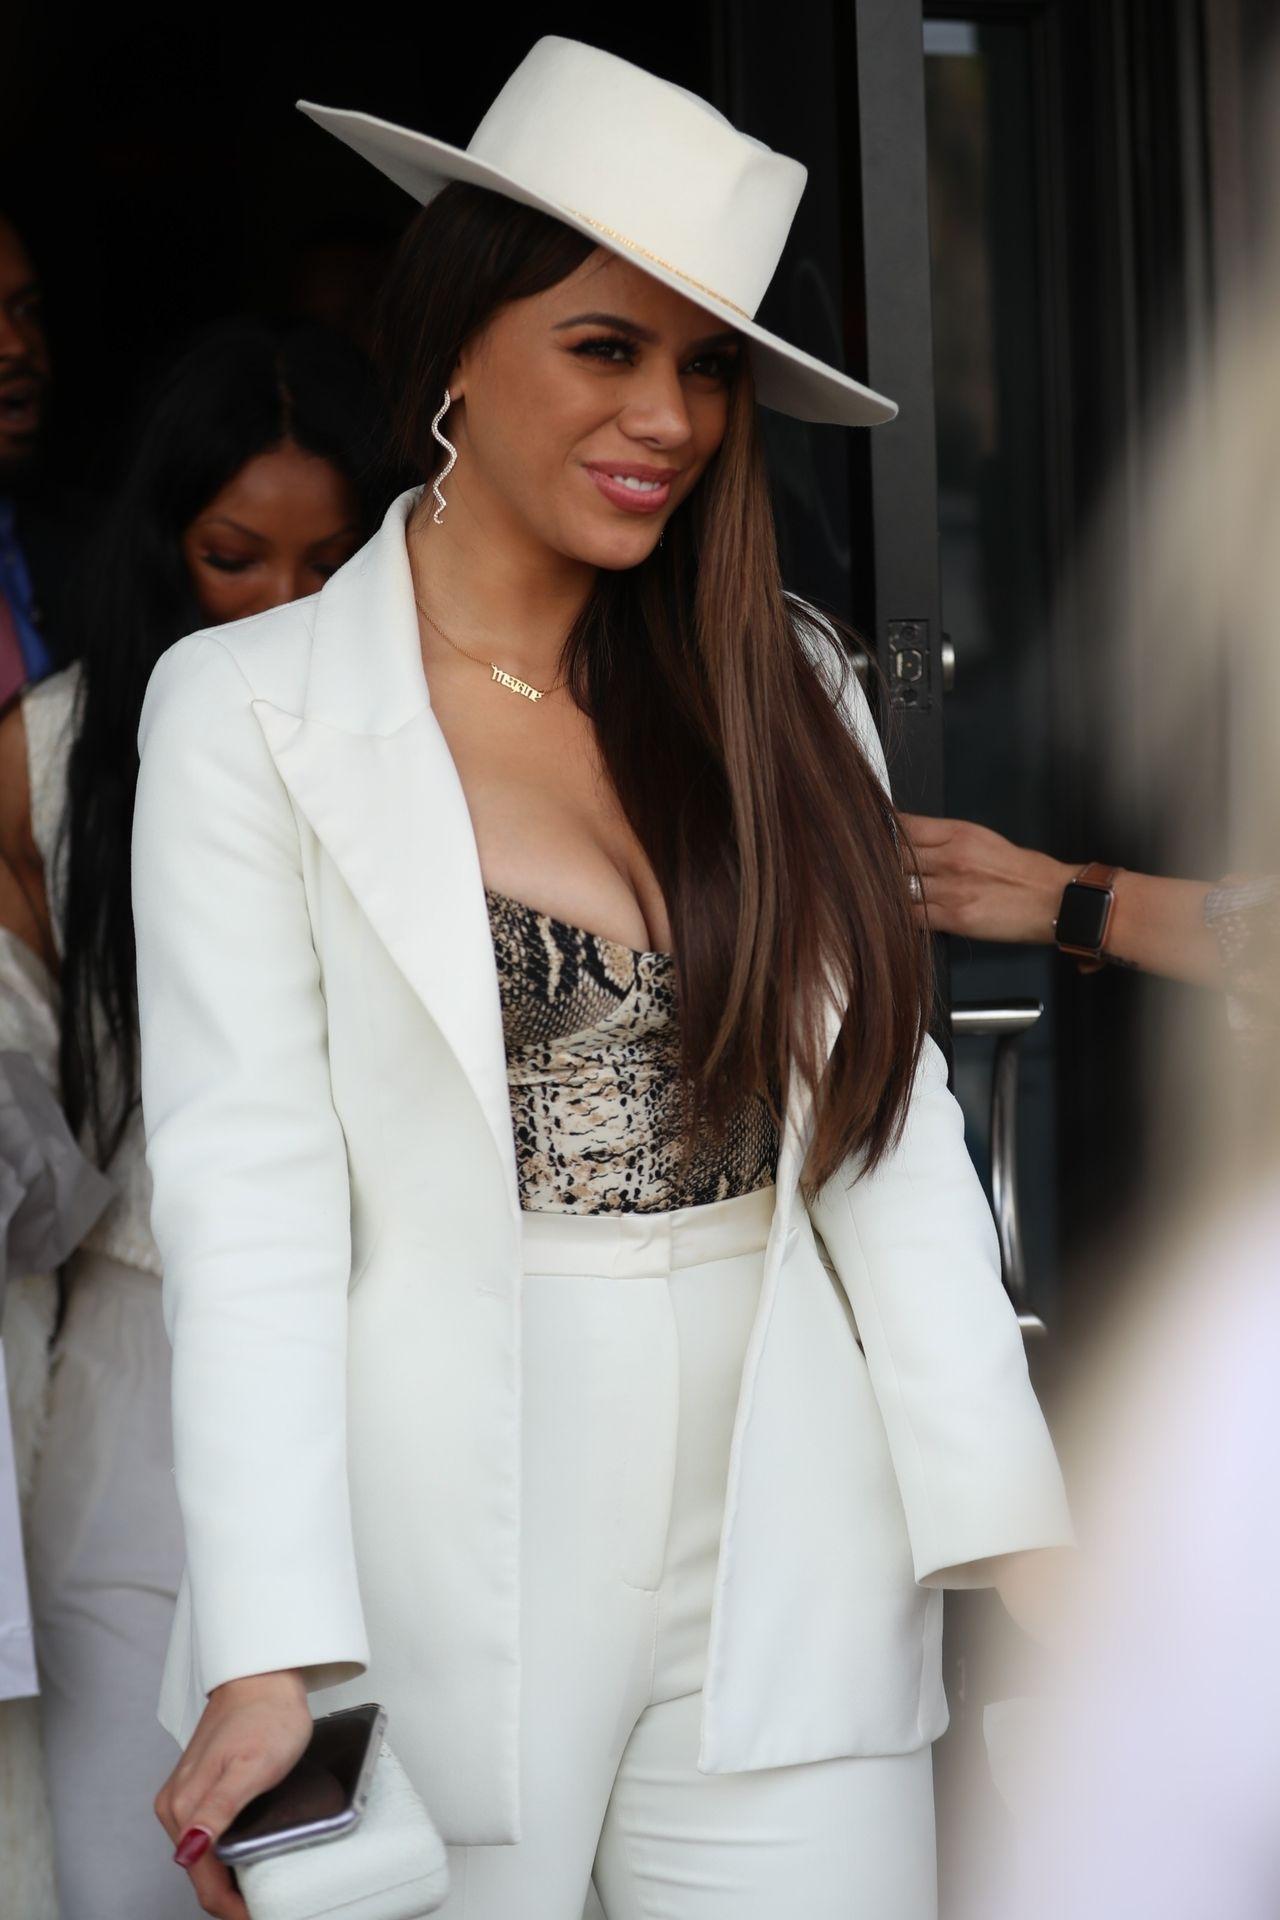 Dinah Jane Departs The Women In Harmony Pre Grammy Luncheon 0030